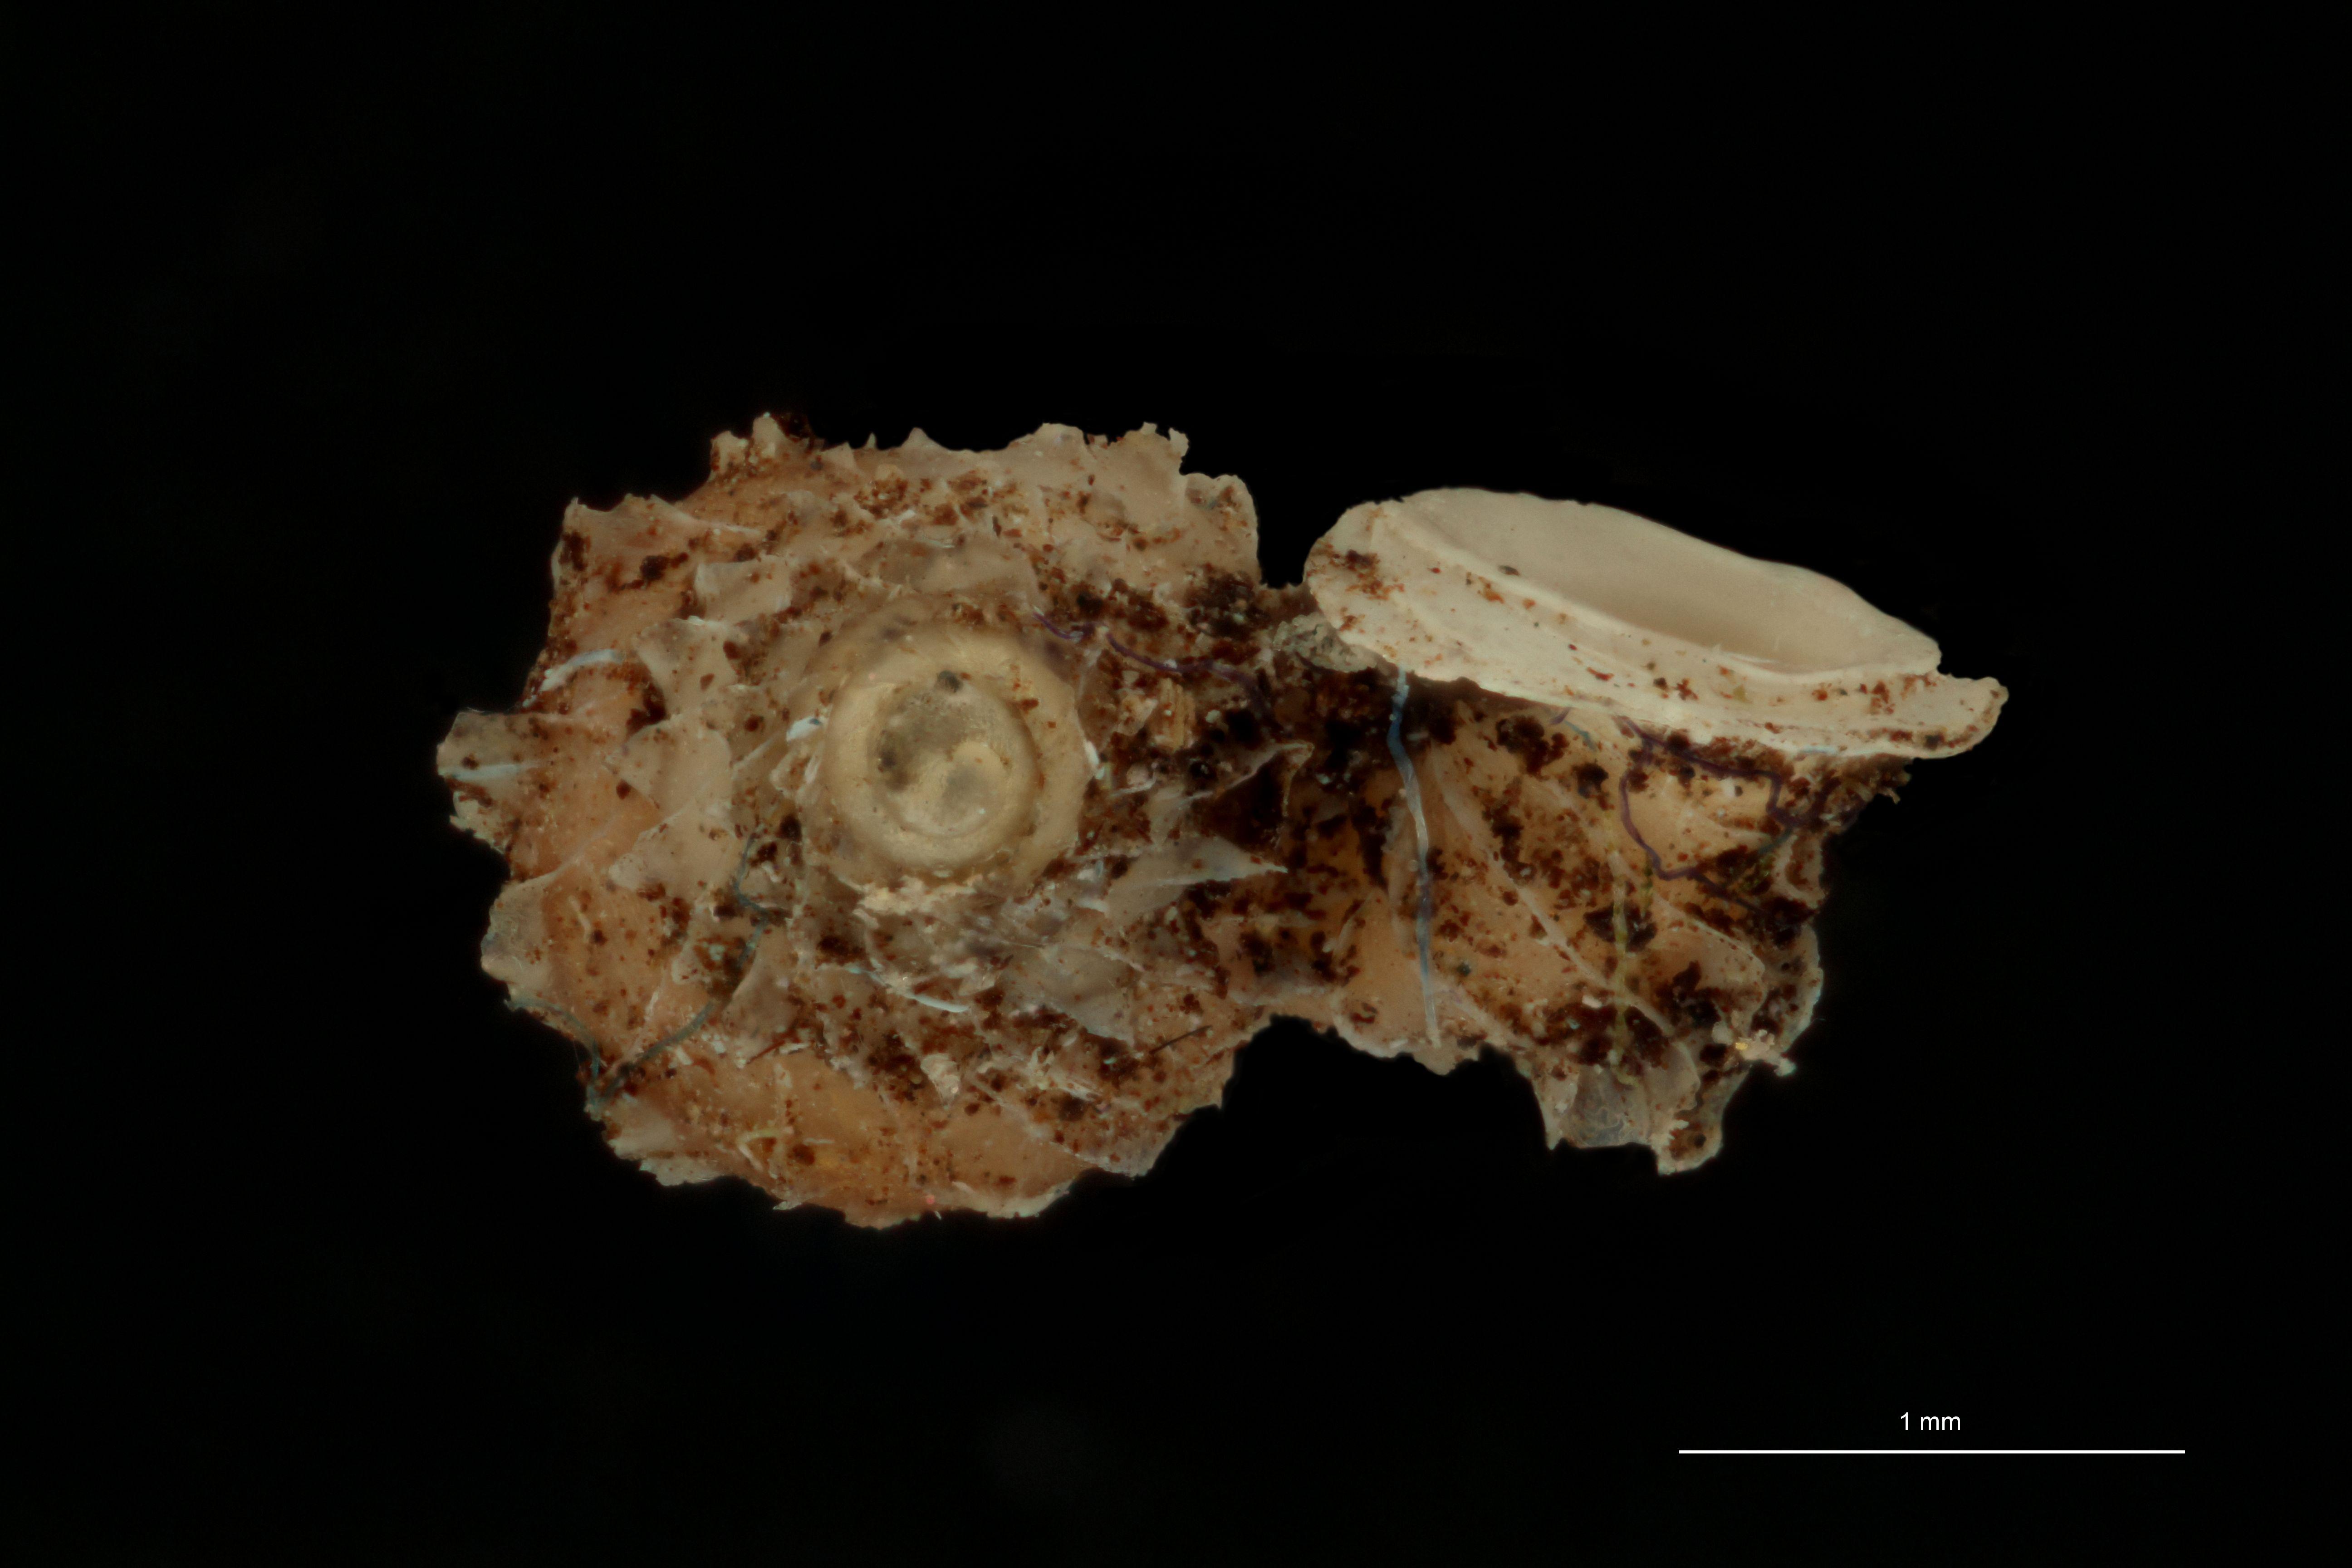 BE-RBINS-INV PARATYPE MT 1034 Opisthostoma (Geothauma) smithi ANTERIOR.jpg